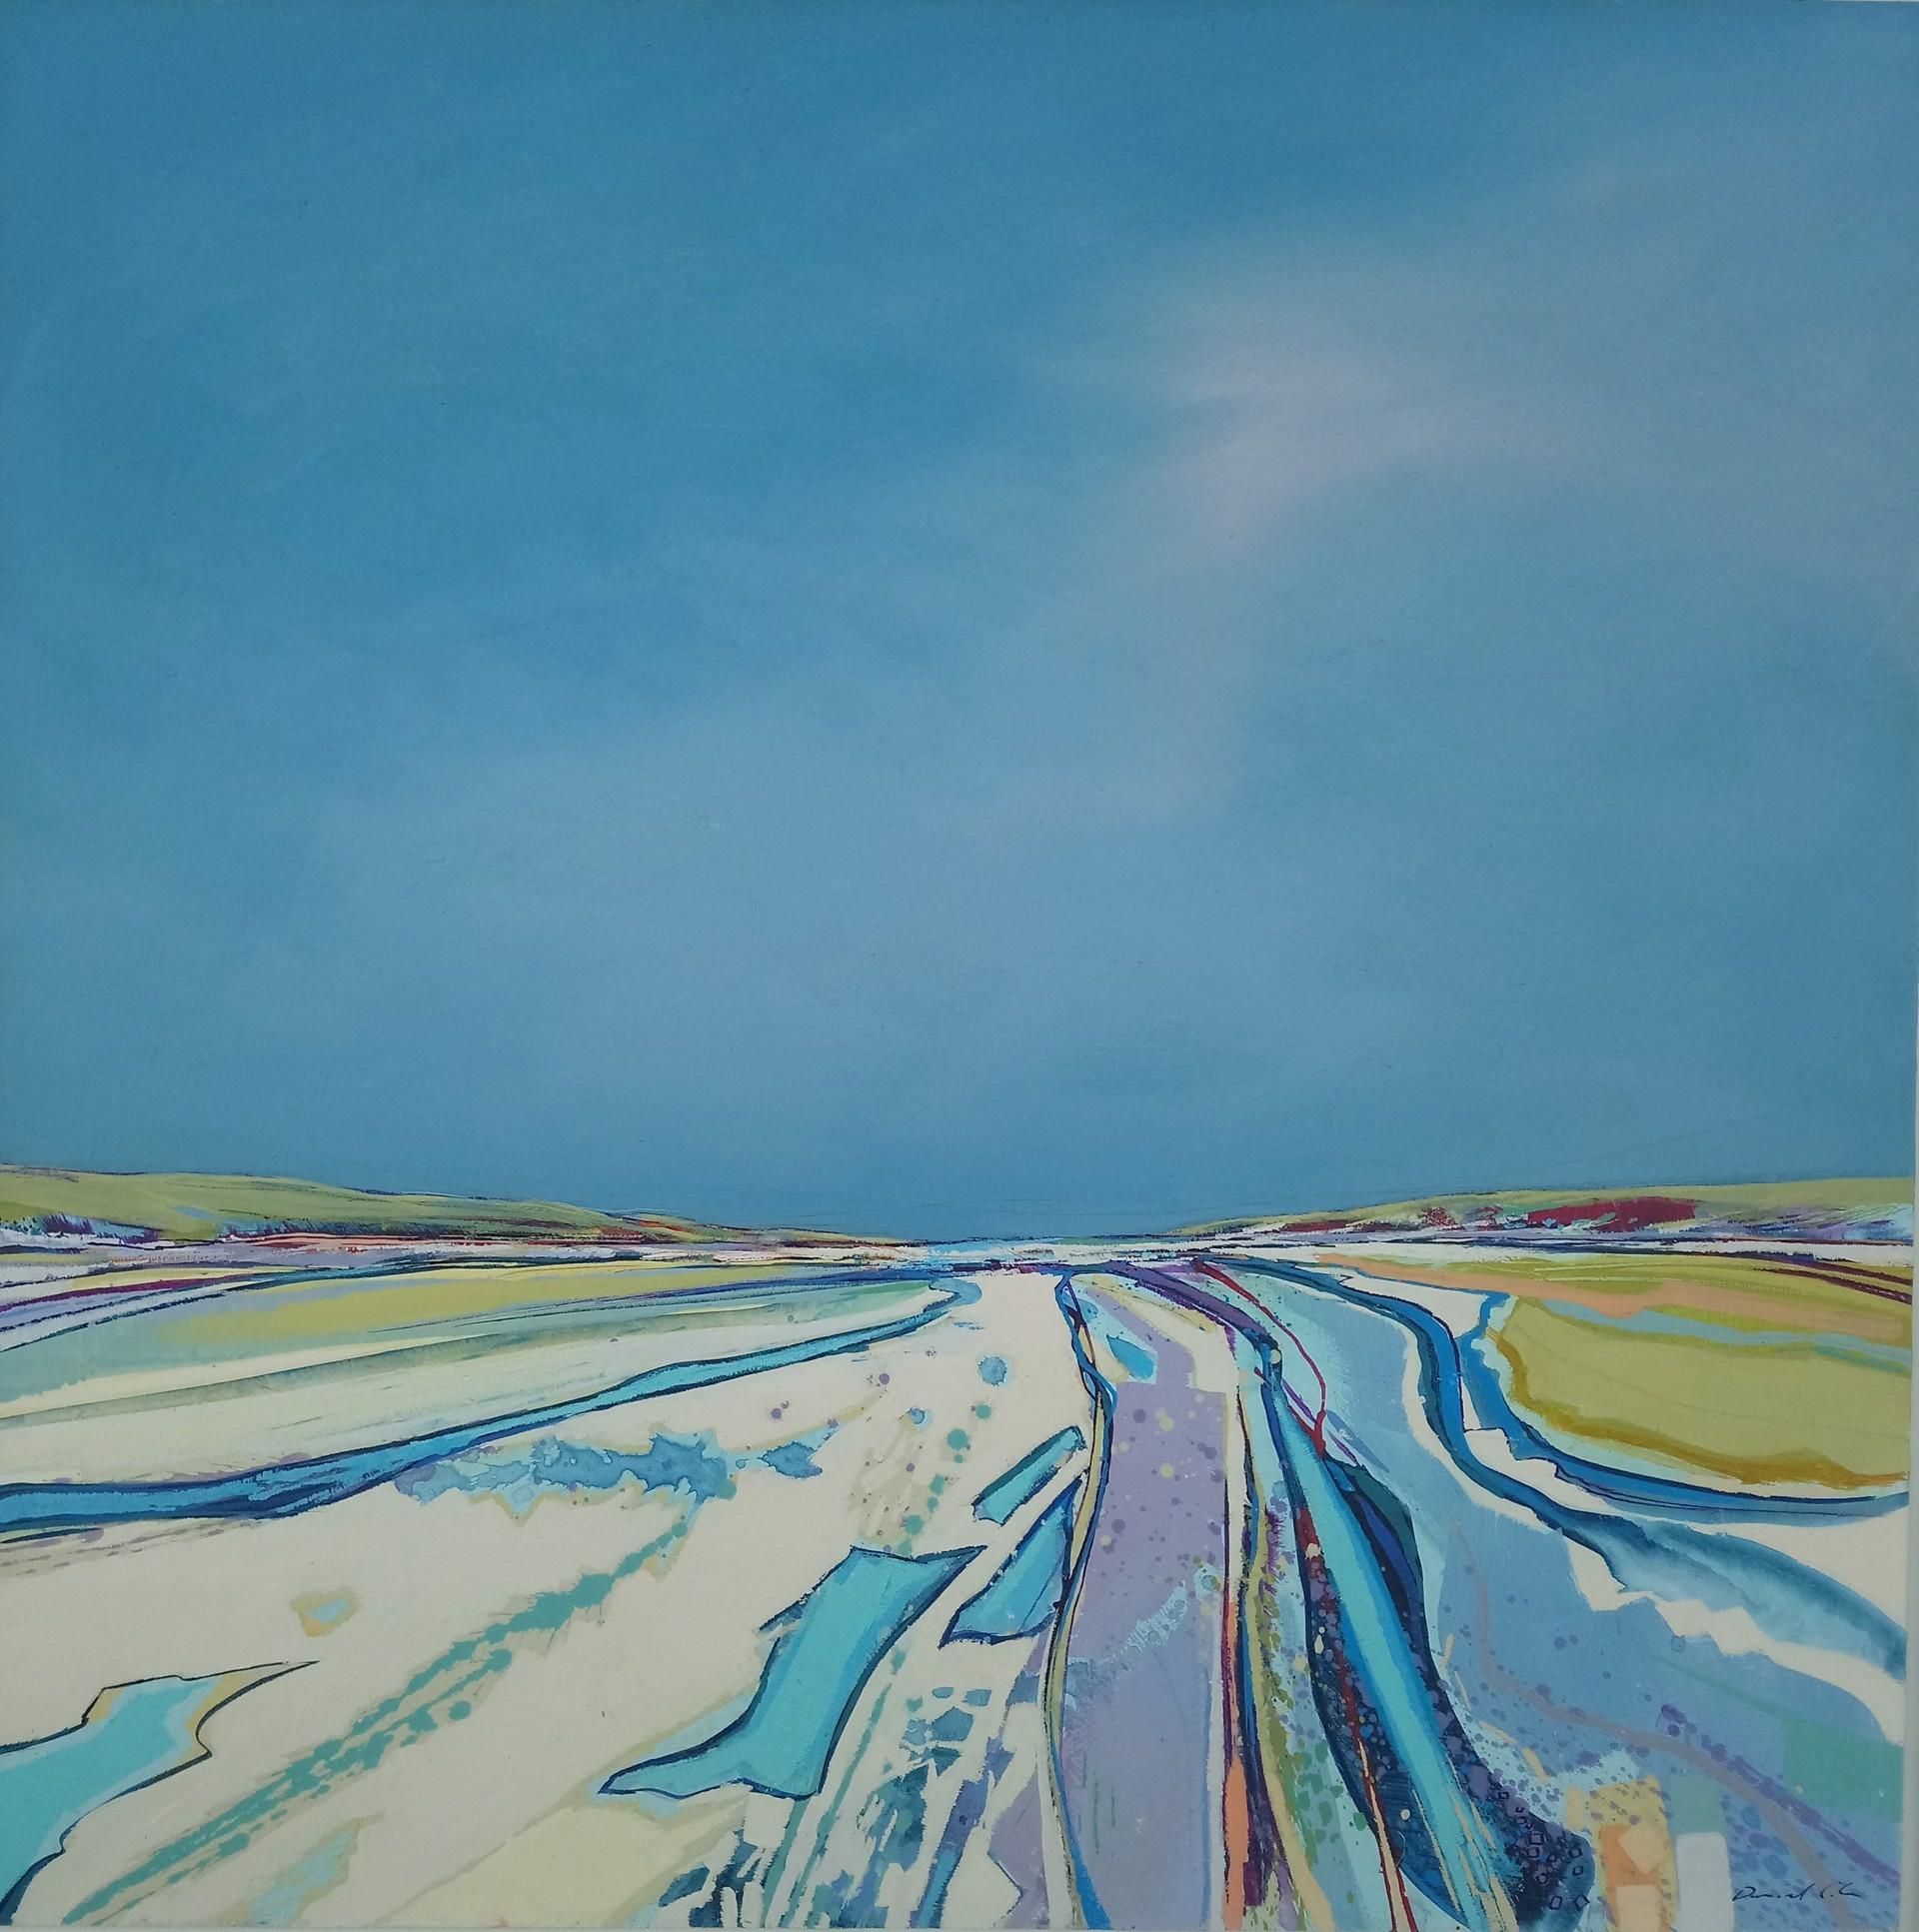 Watermarks and Sandlines, Holkam Beach, Norfolk by Daniel Cole